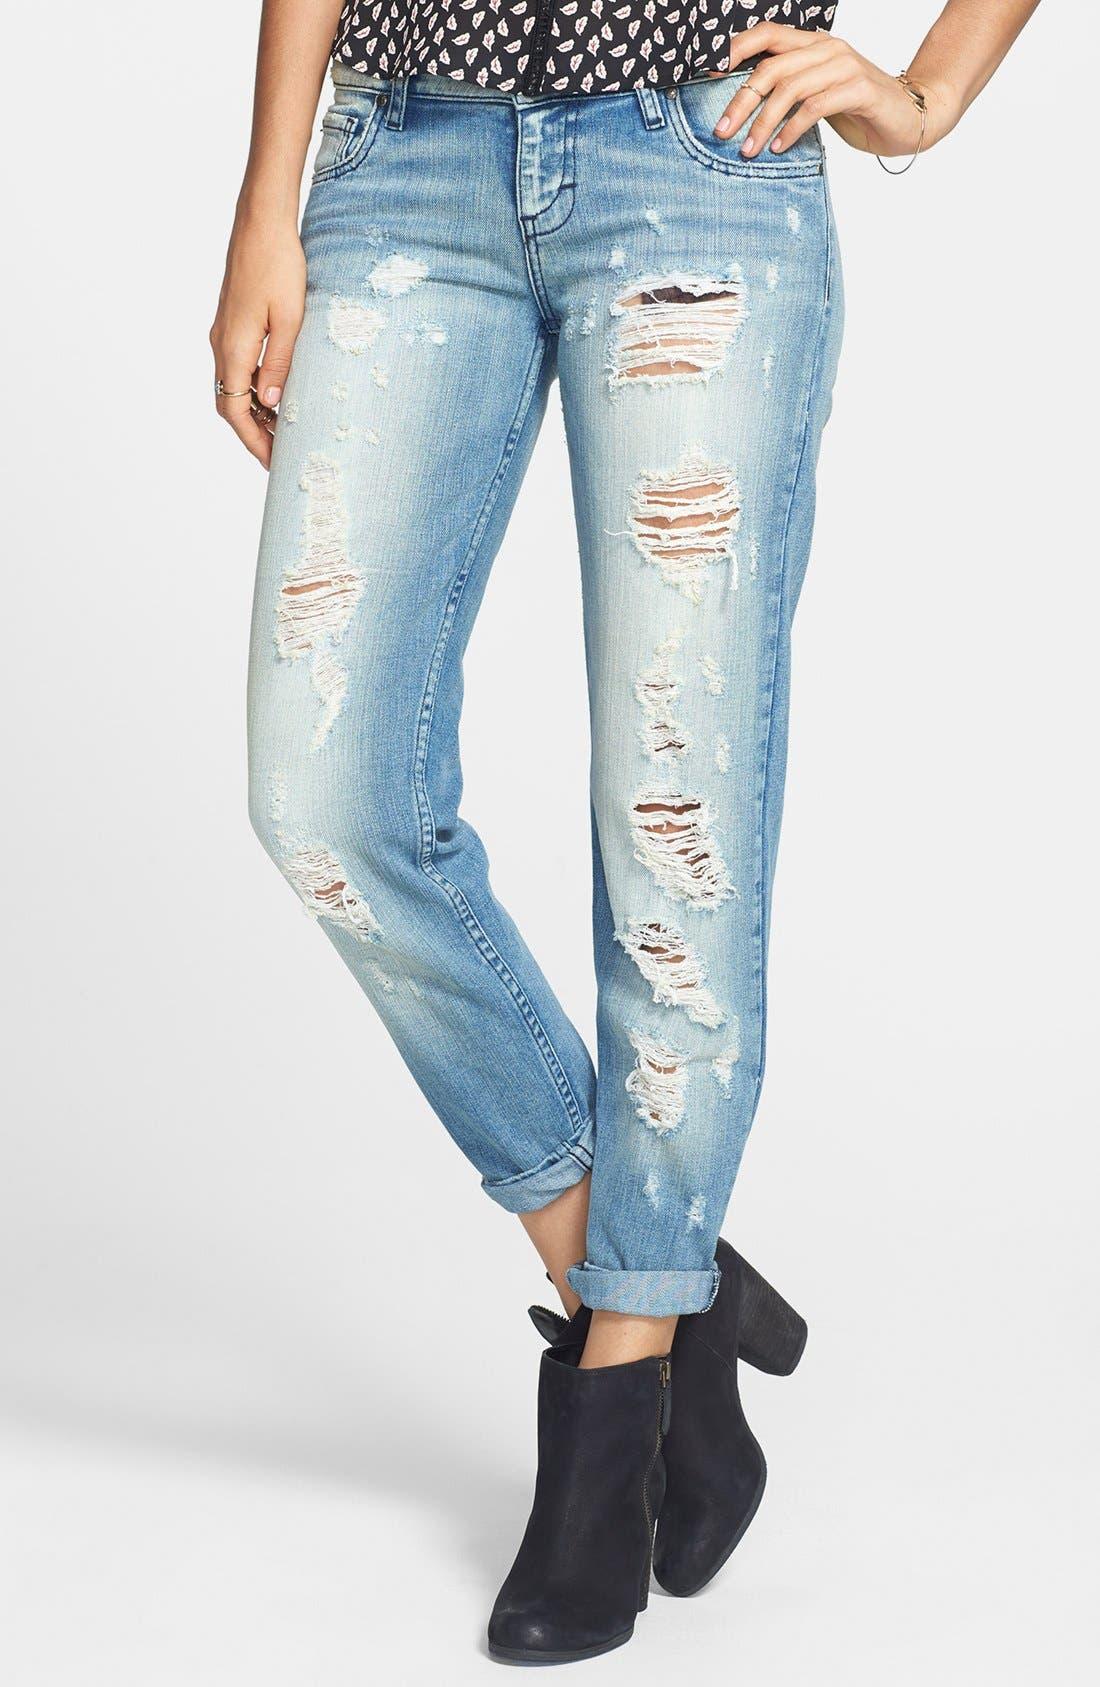 Alternate Image 1 Selected - STS Blue 'Joey' Destroyed Boyfriend Jeans